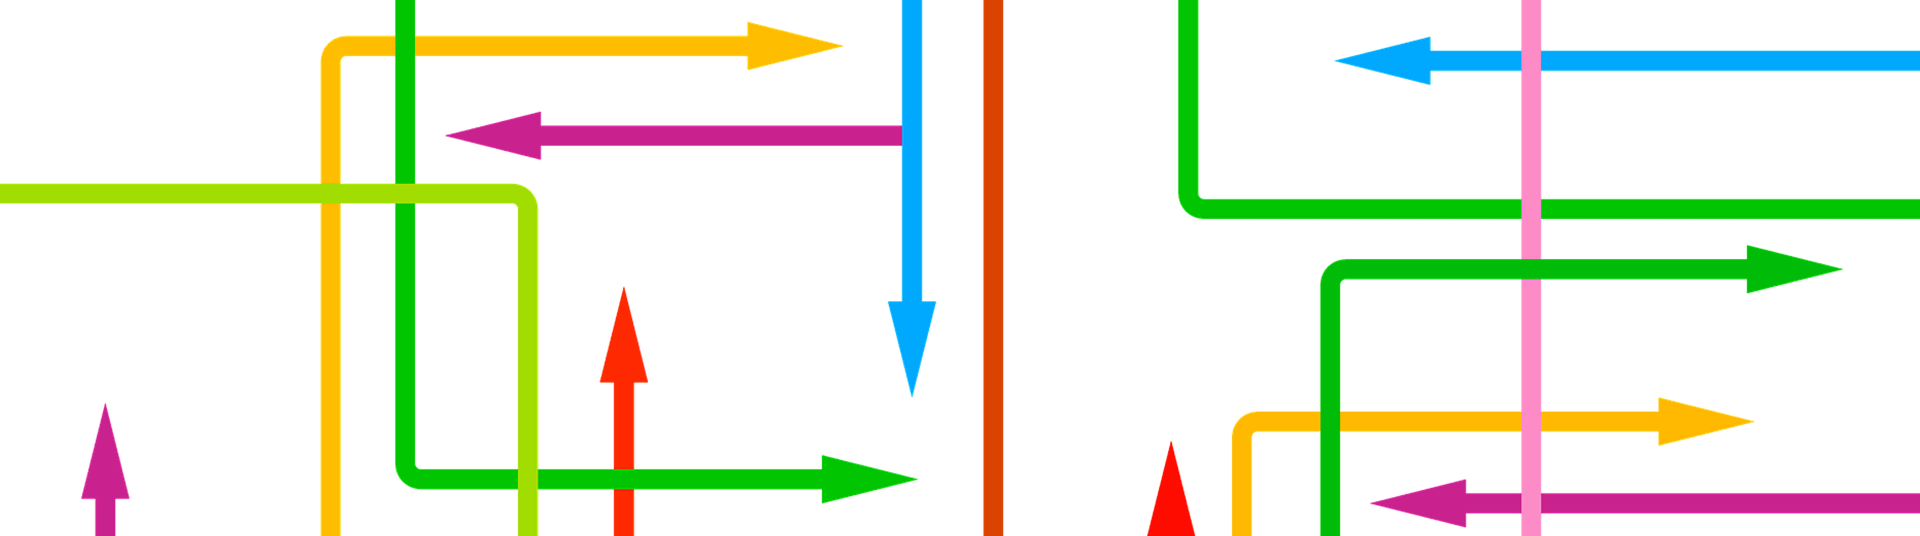 Organograma Linear